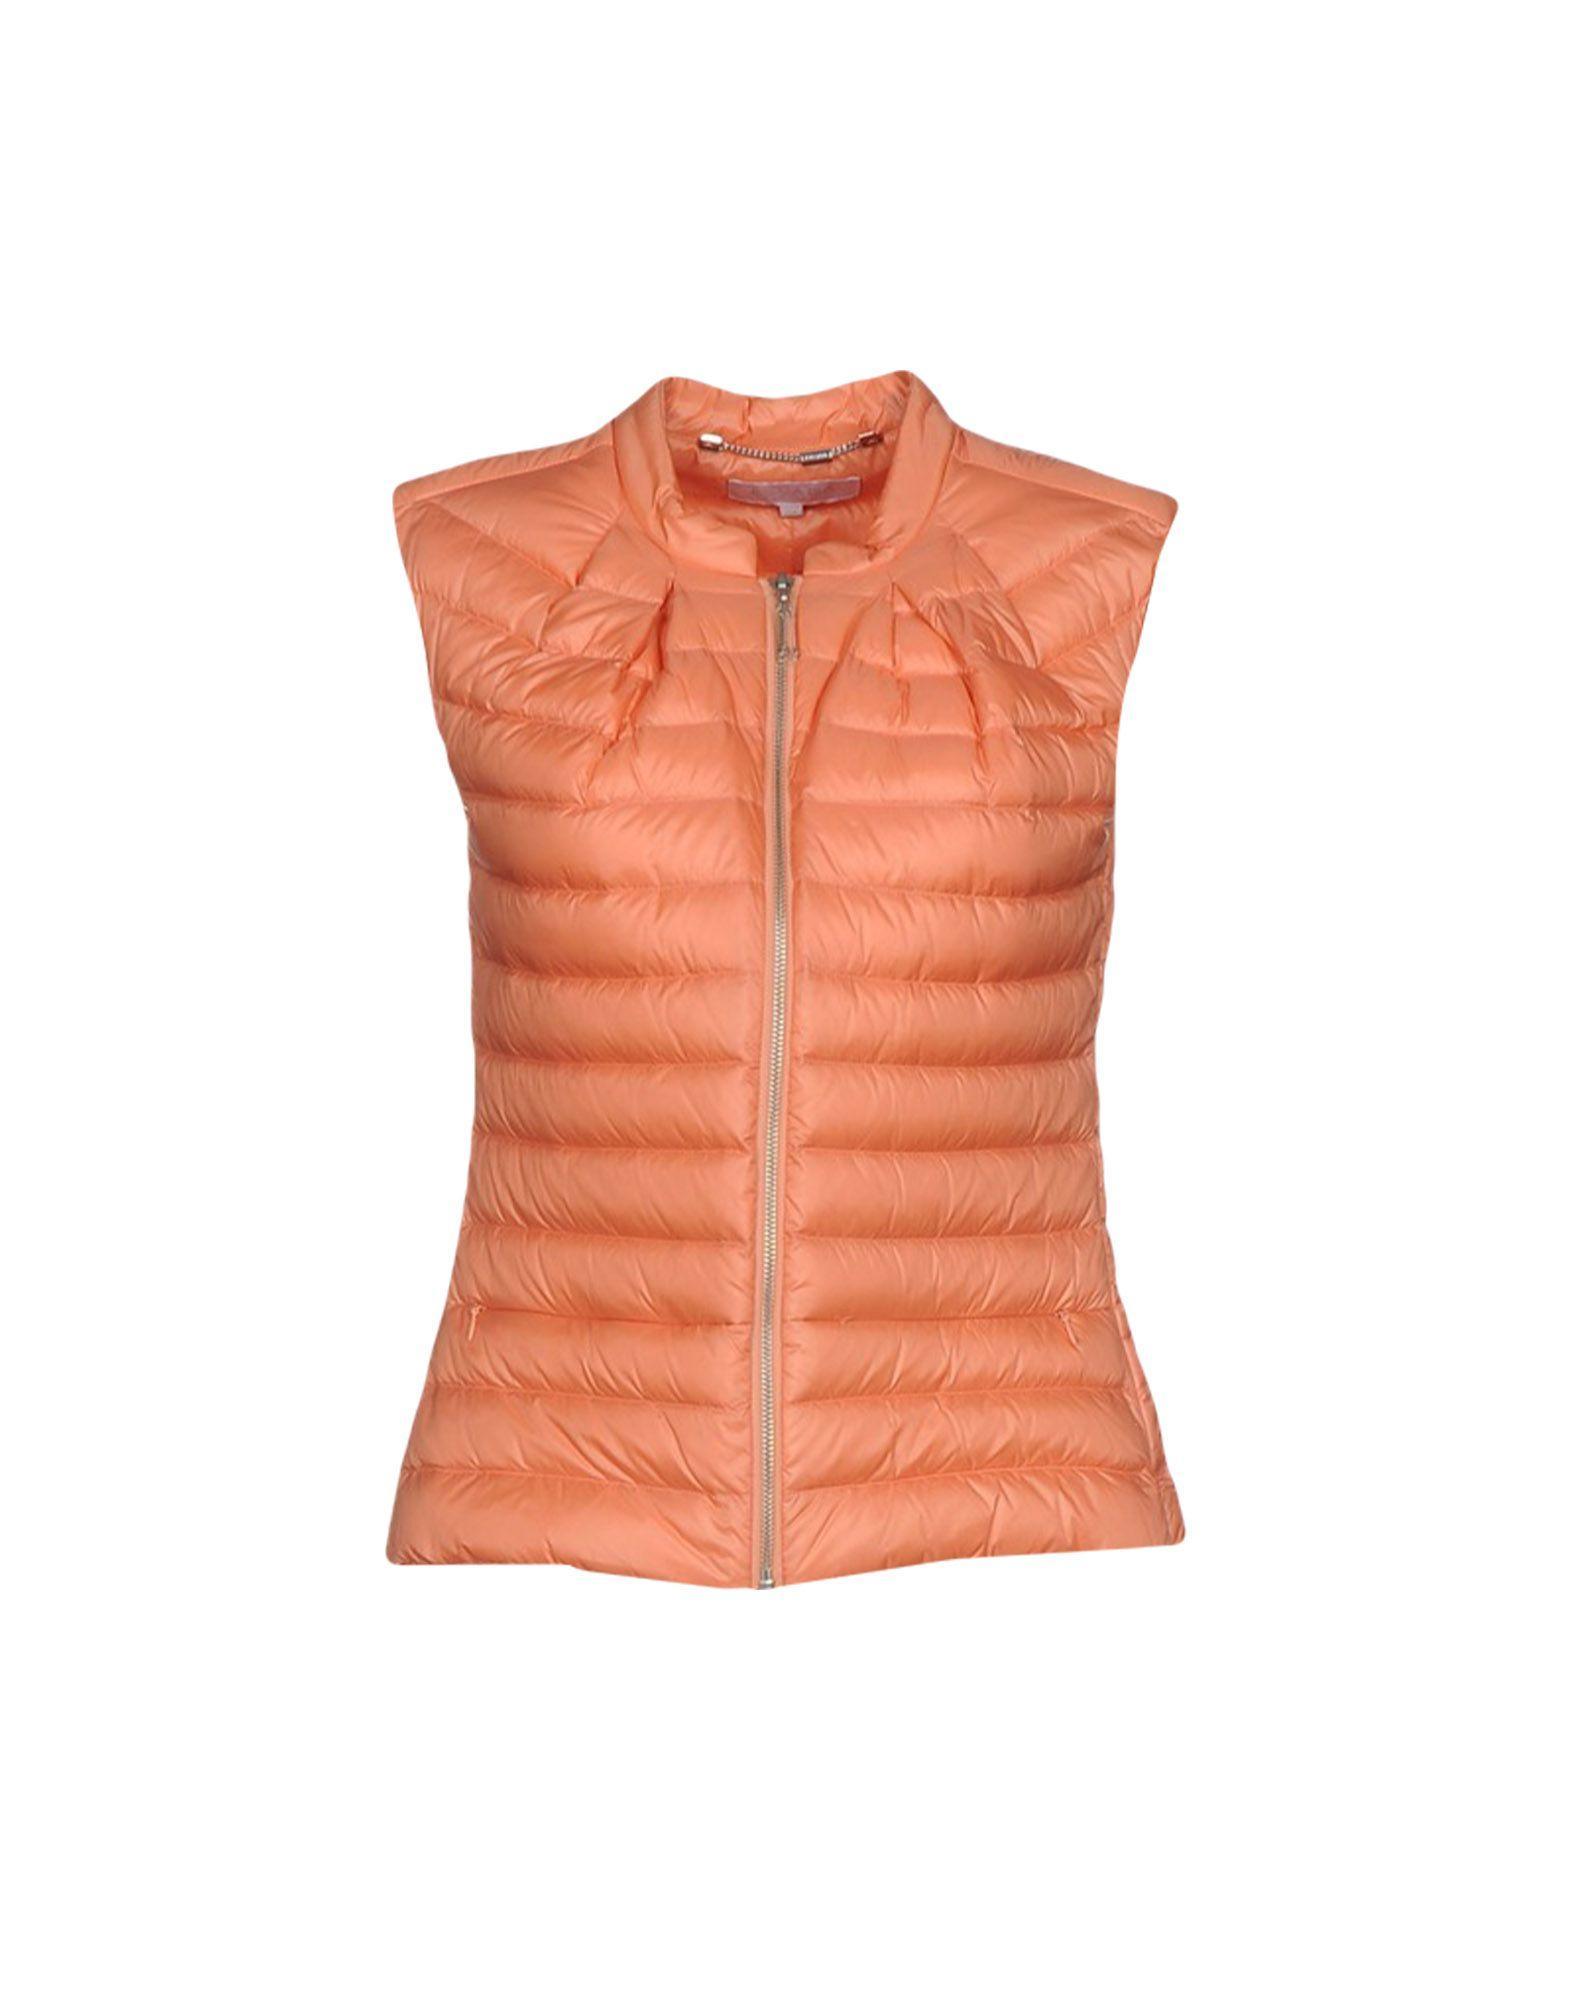 Escada Sport Down Jacket In Salmon Pink